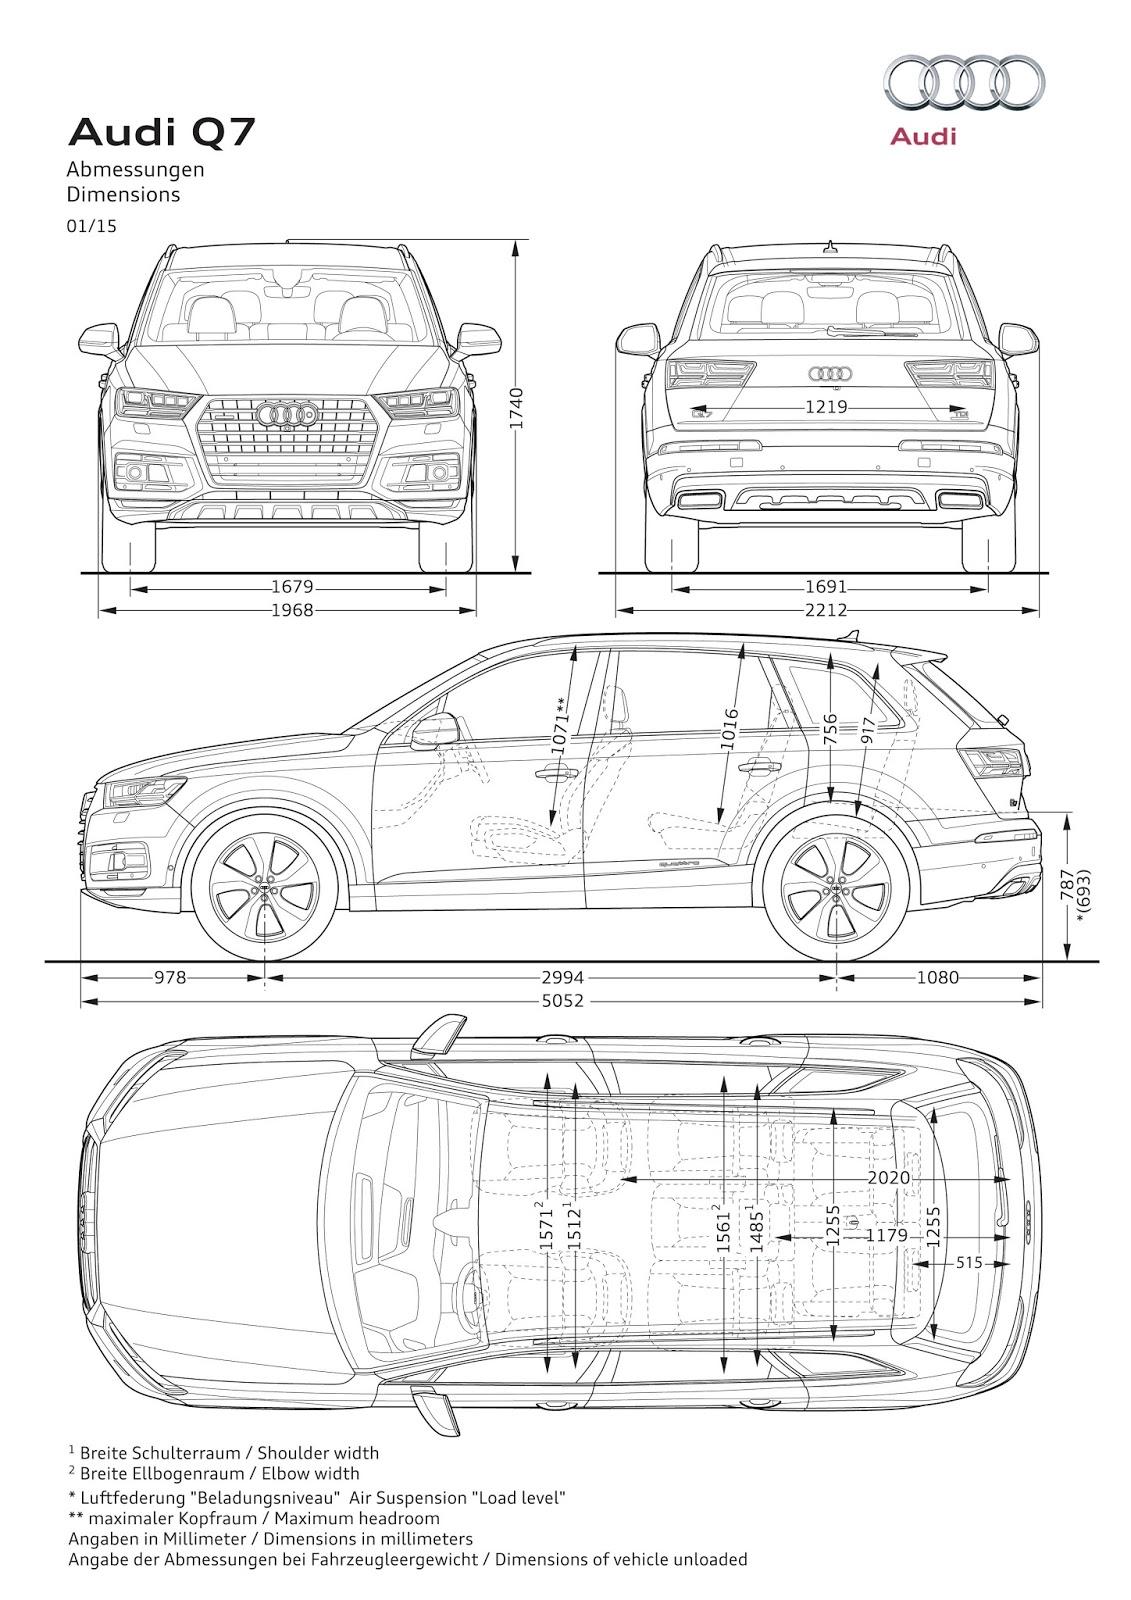 2004 Audi S4 B6 V8 Engine As Well Subaru Outback Engine Diagram